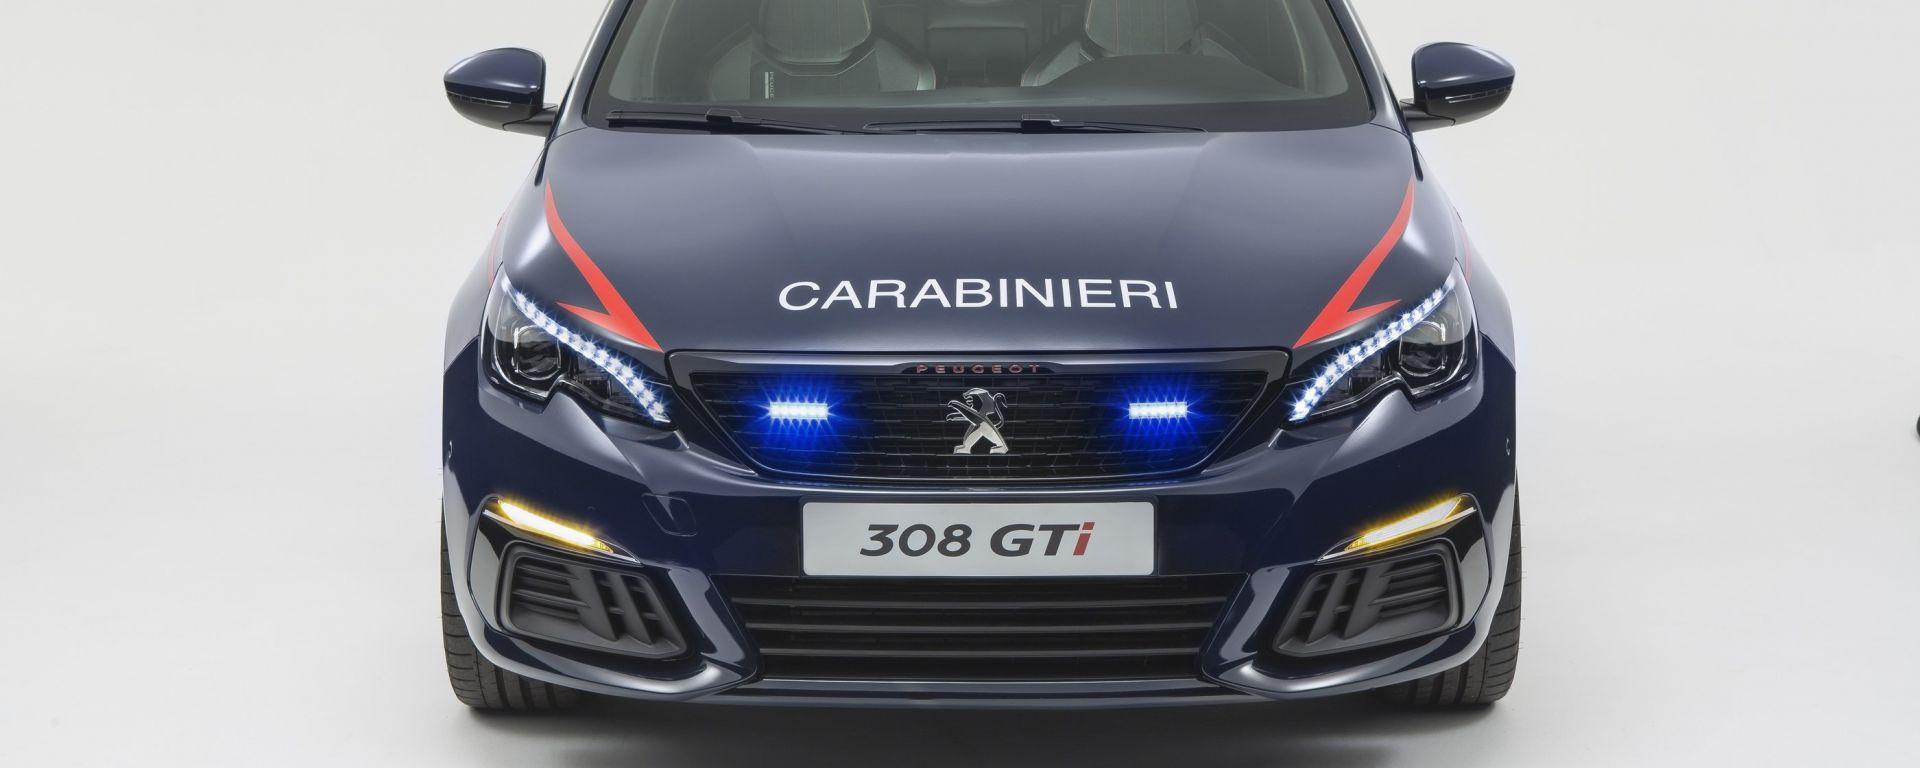 Nuova Peugeot 308 GTi arruolata nell'Arma dei Carabinieri